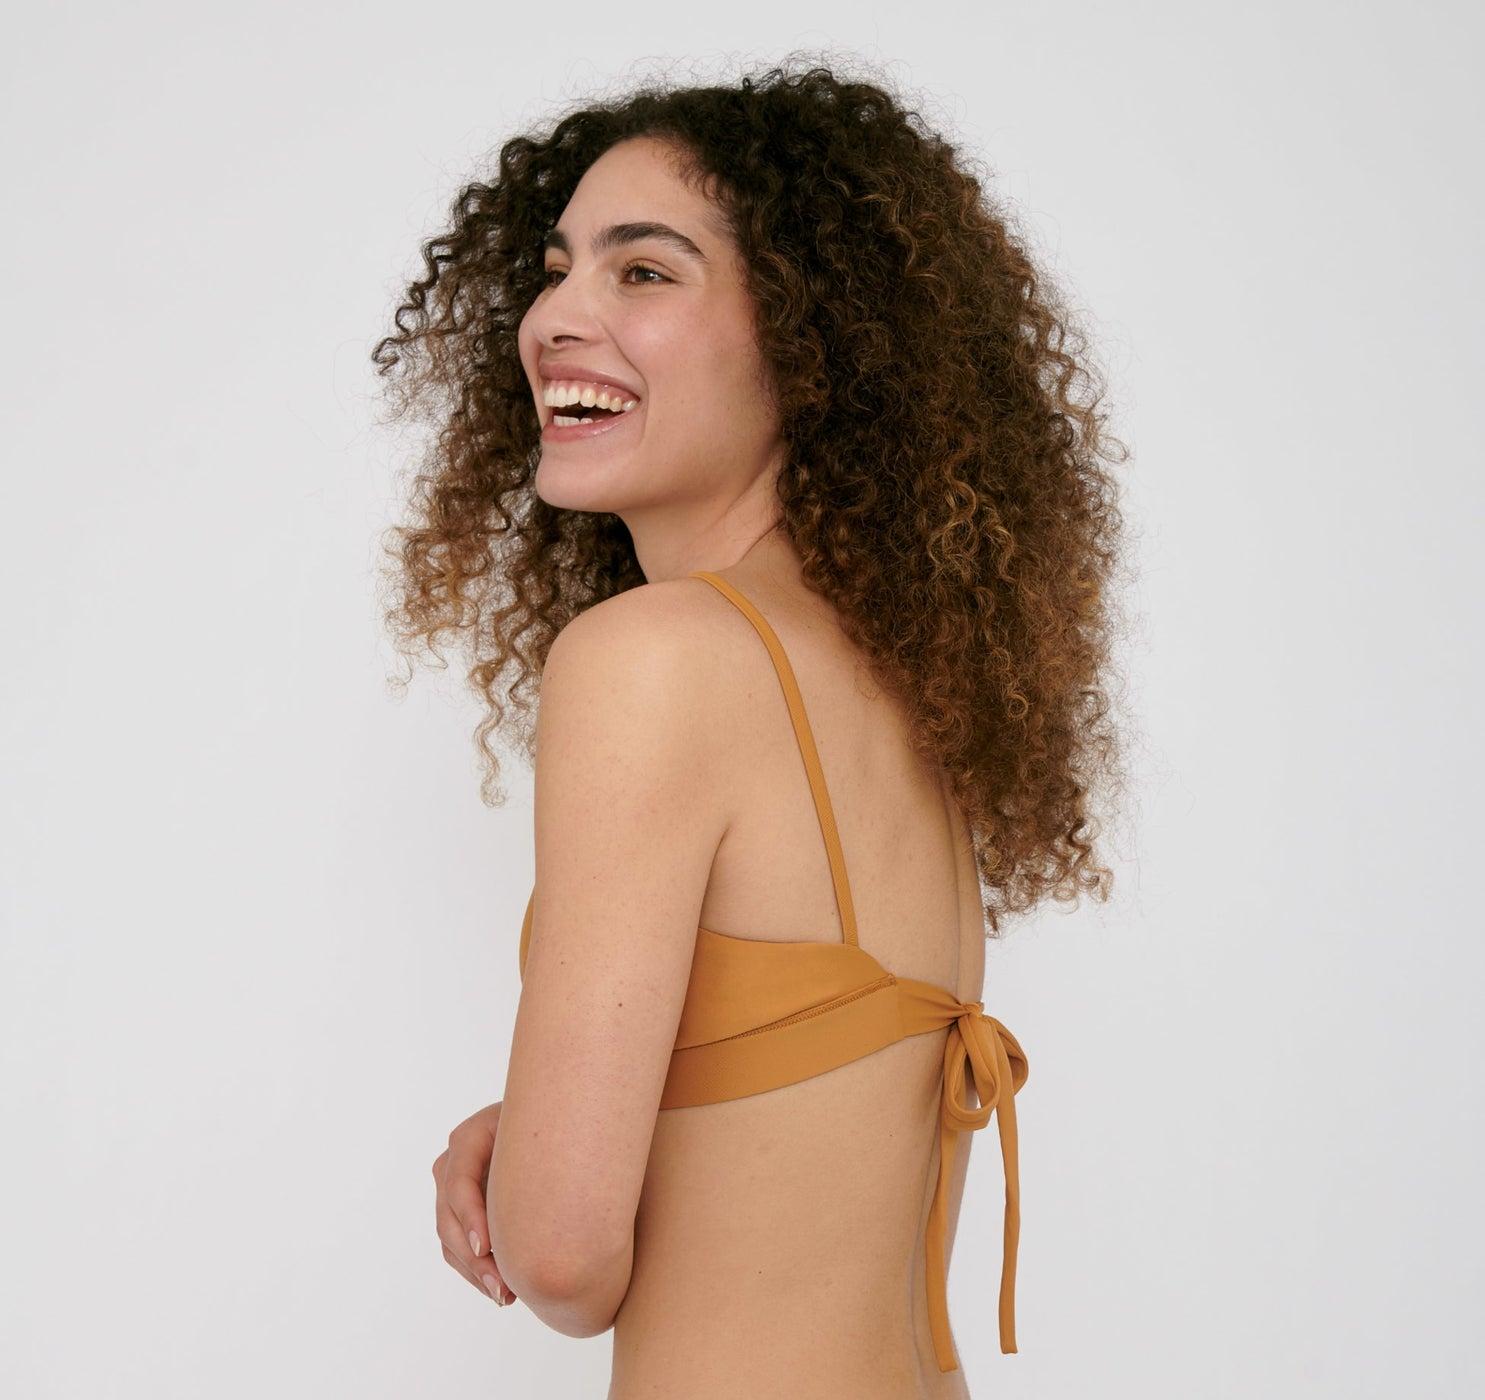 Organic Basics Re-Swim Bikini Top